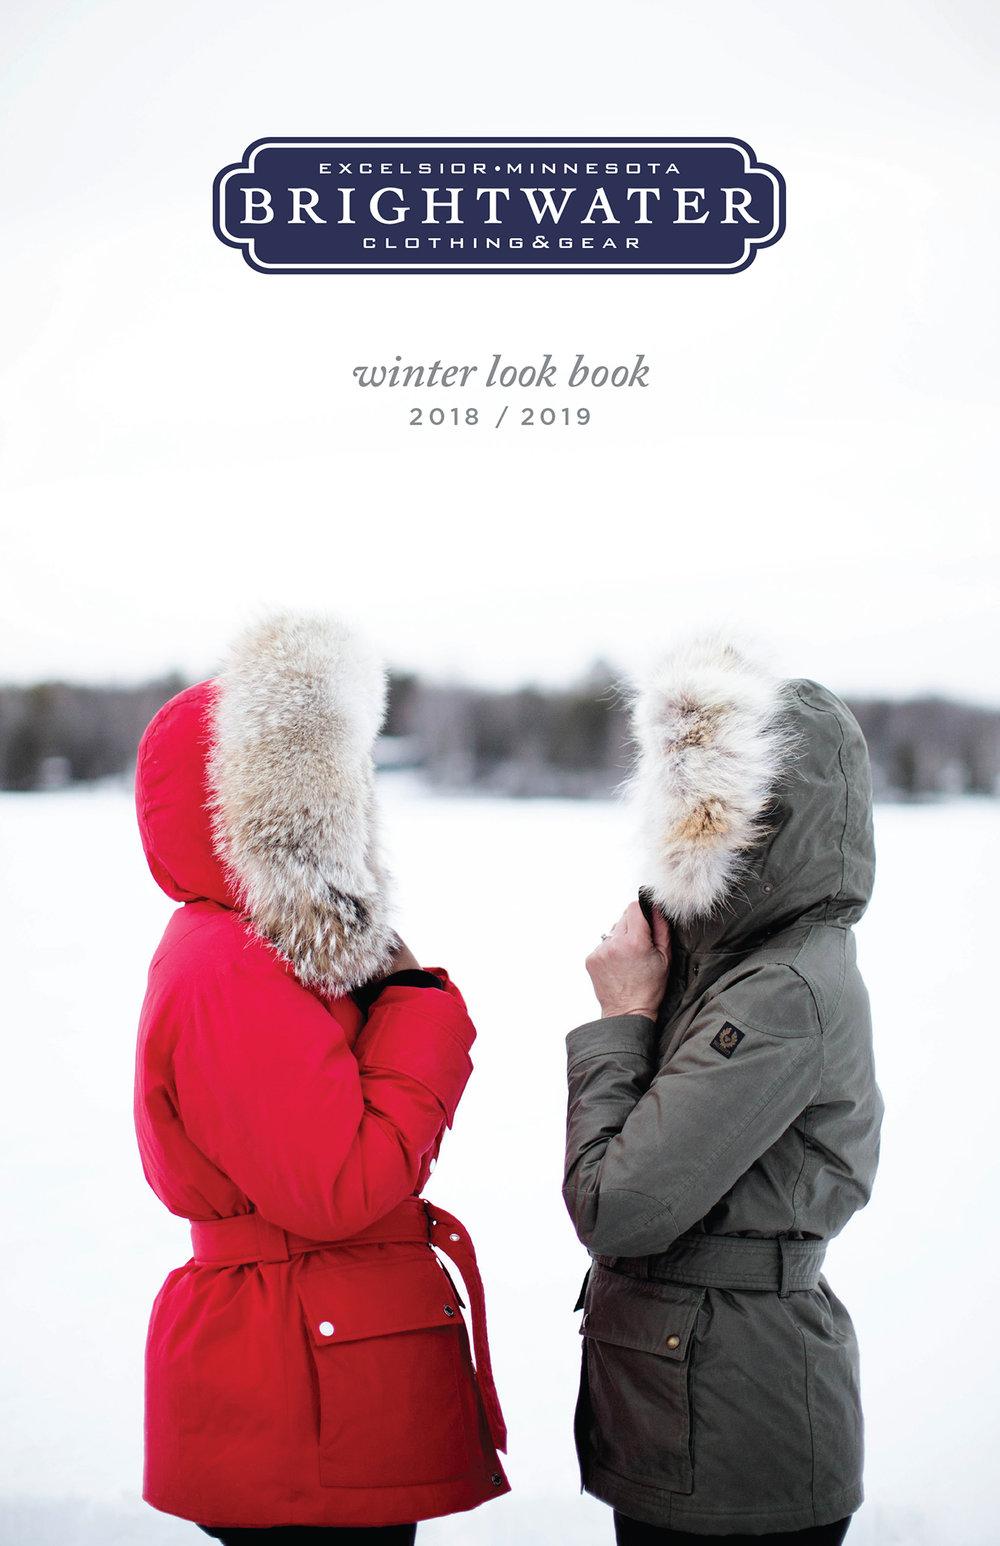 Brightwater Winter 2018%2F2019 Look Book-1.jpg